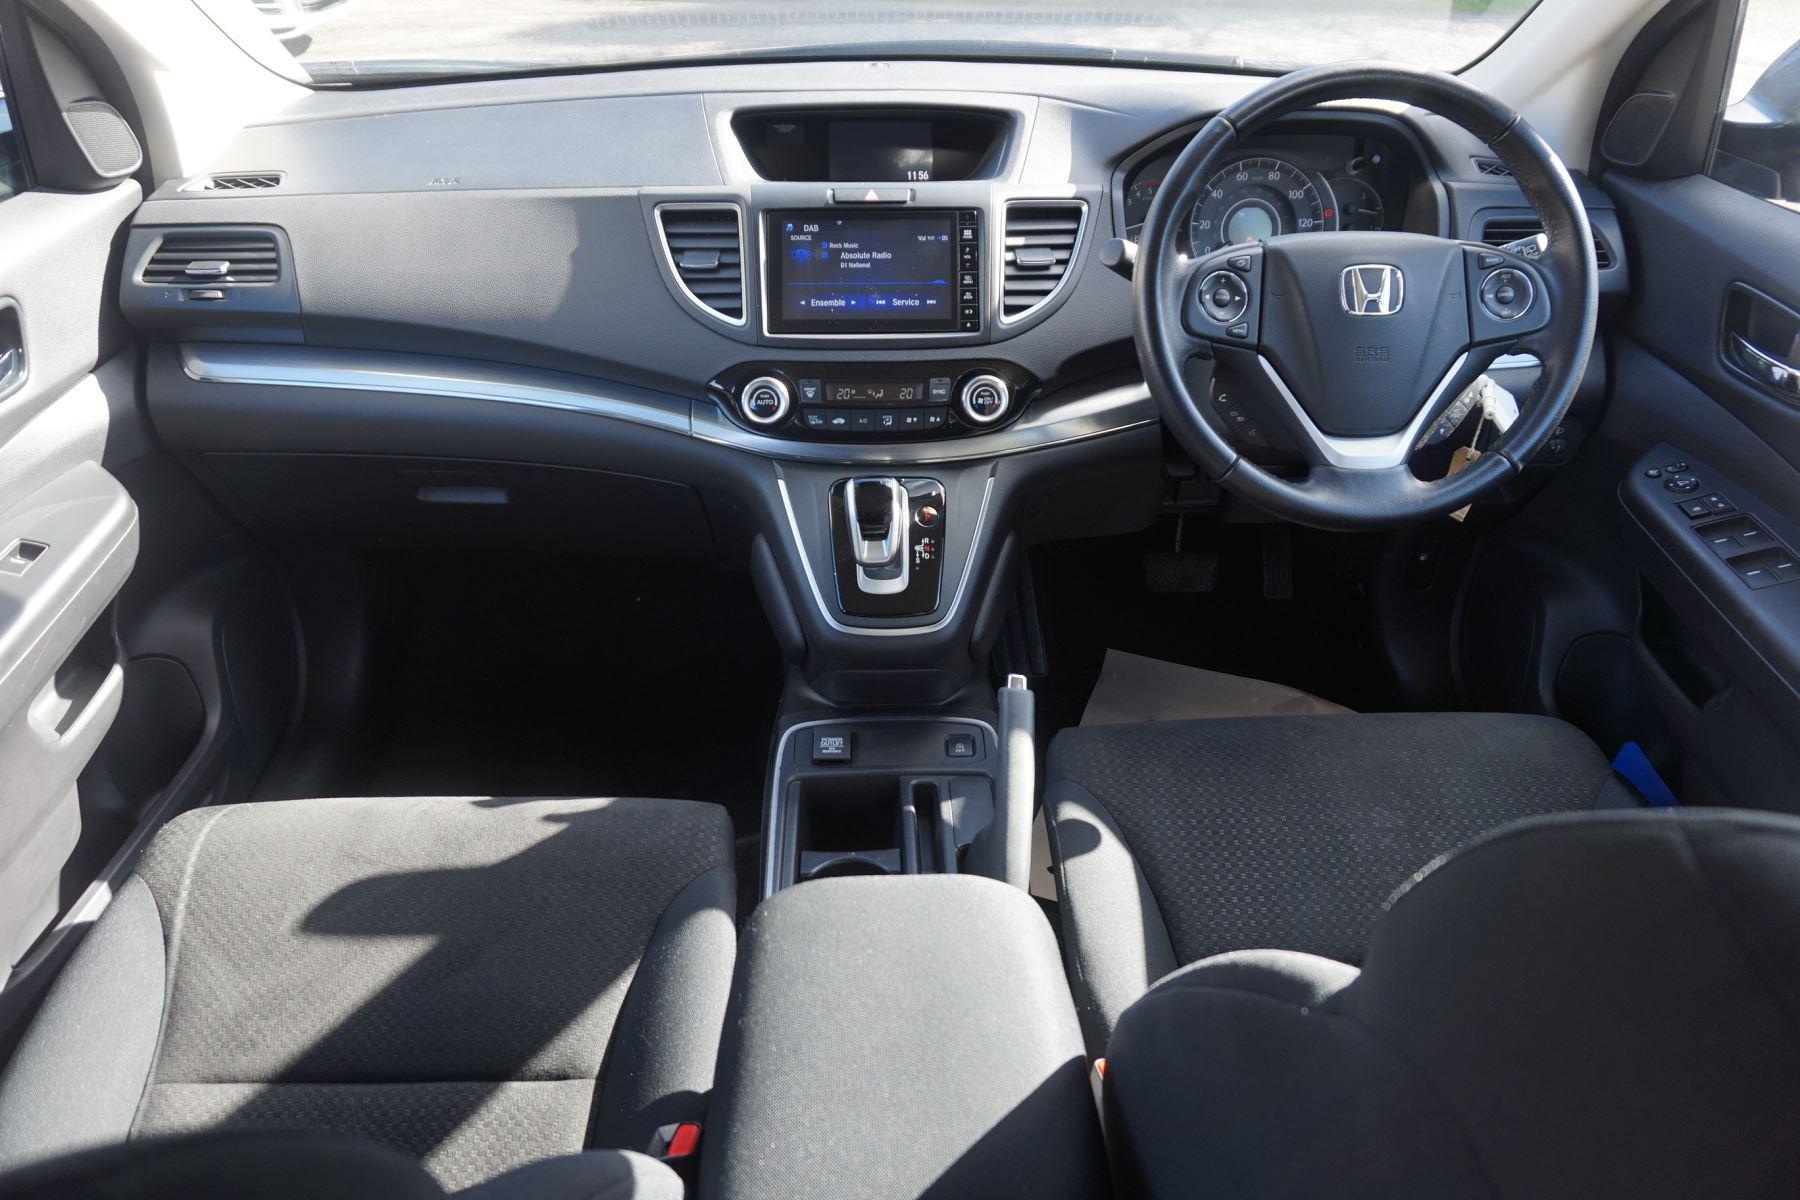 Honda CR-V 1.6 i-DTEC 160 SE Plus 5dr [Nav] 4WD image 10